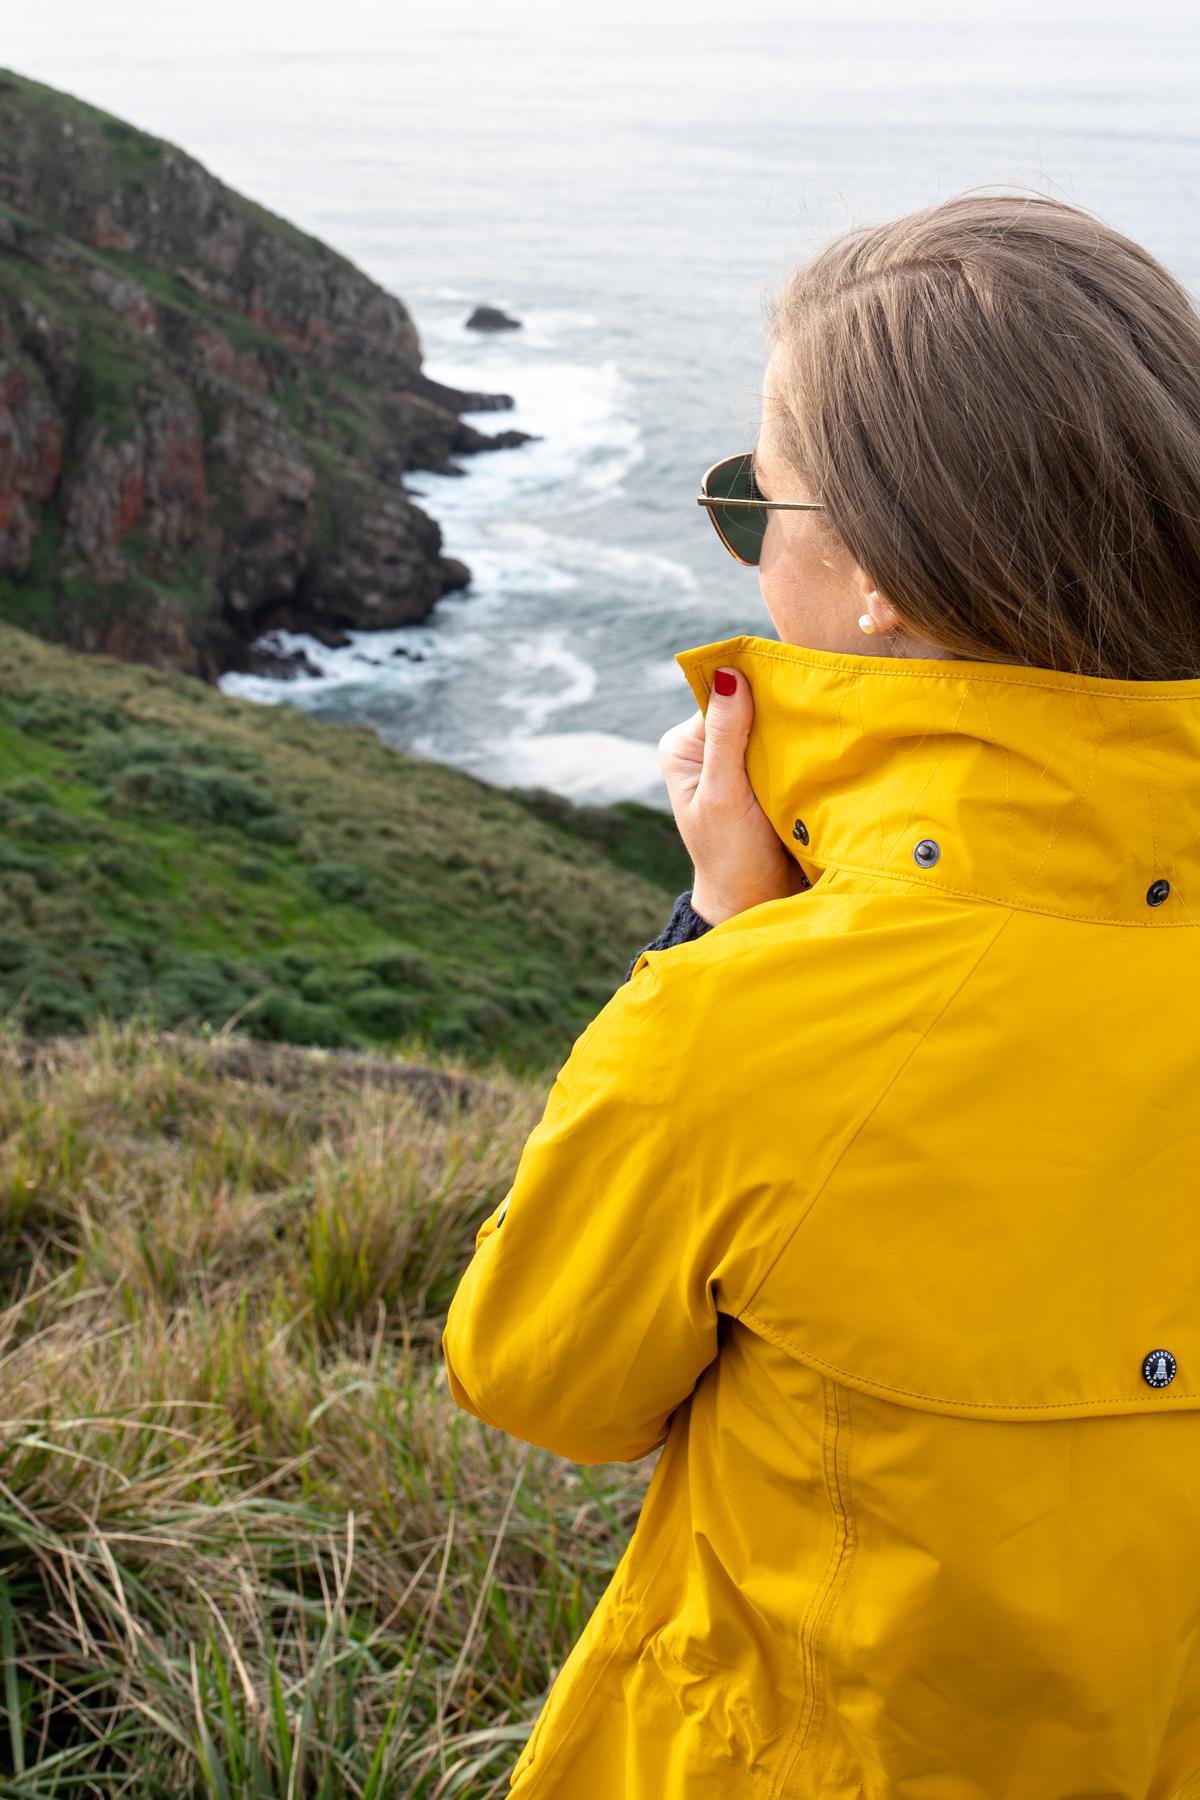 Stacie Flinner Yellow Raincoat-12.jpg